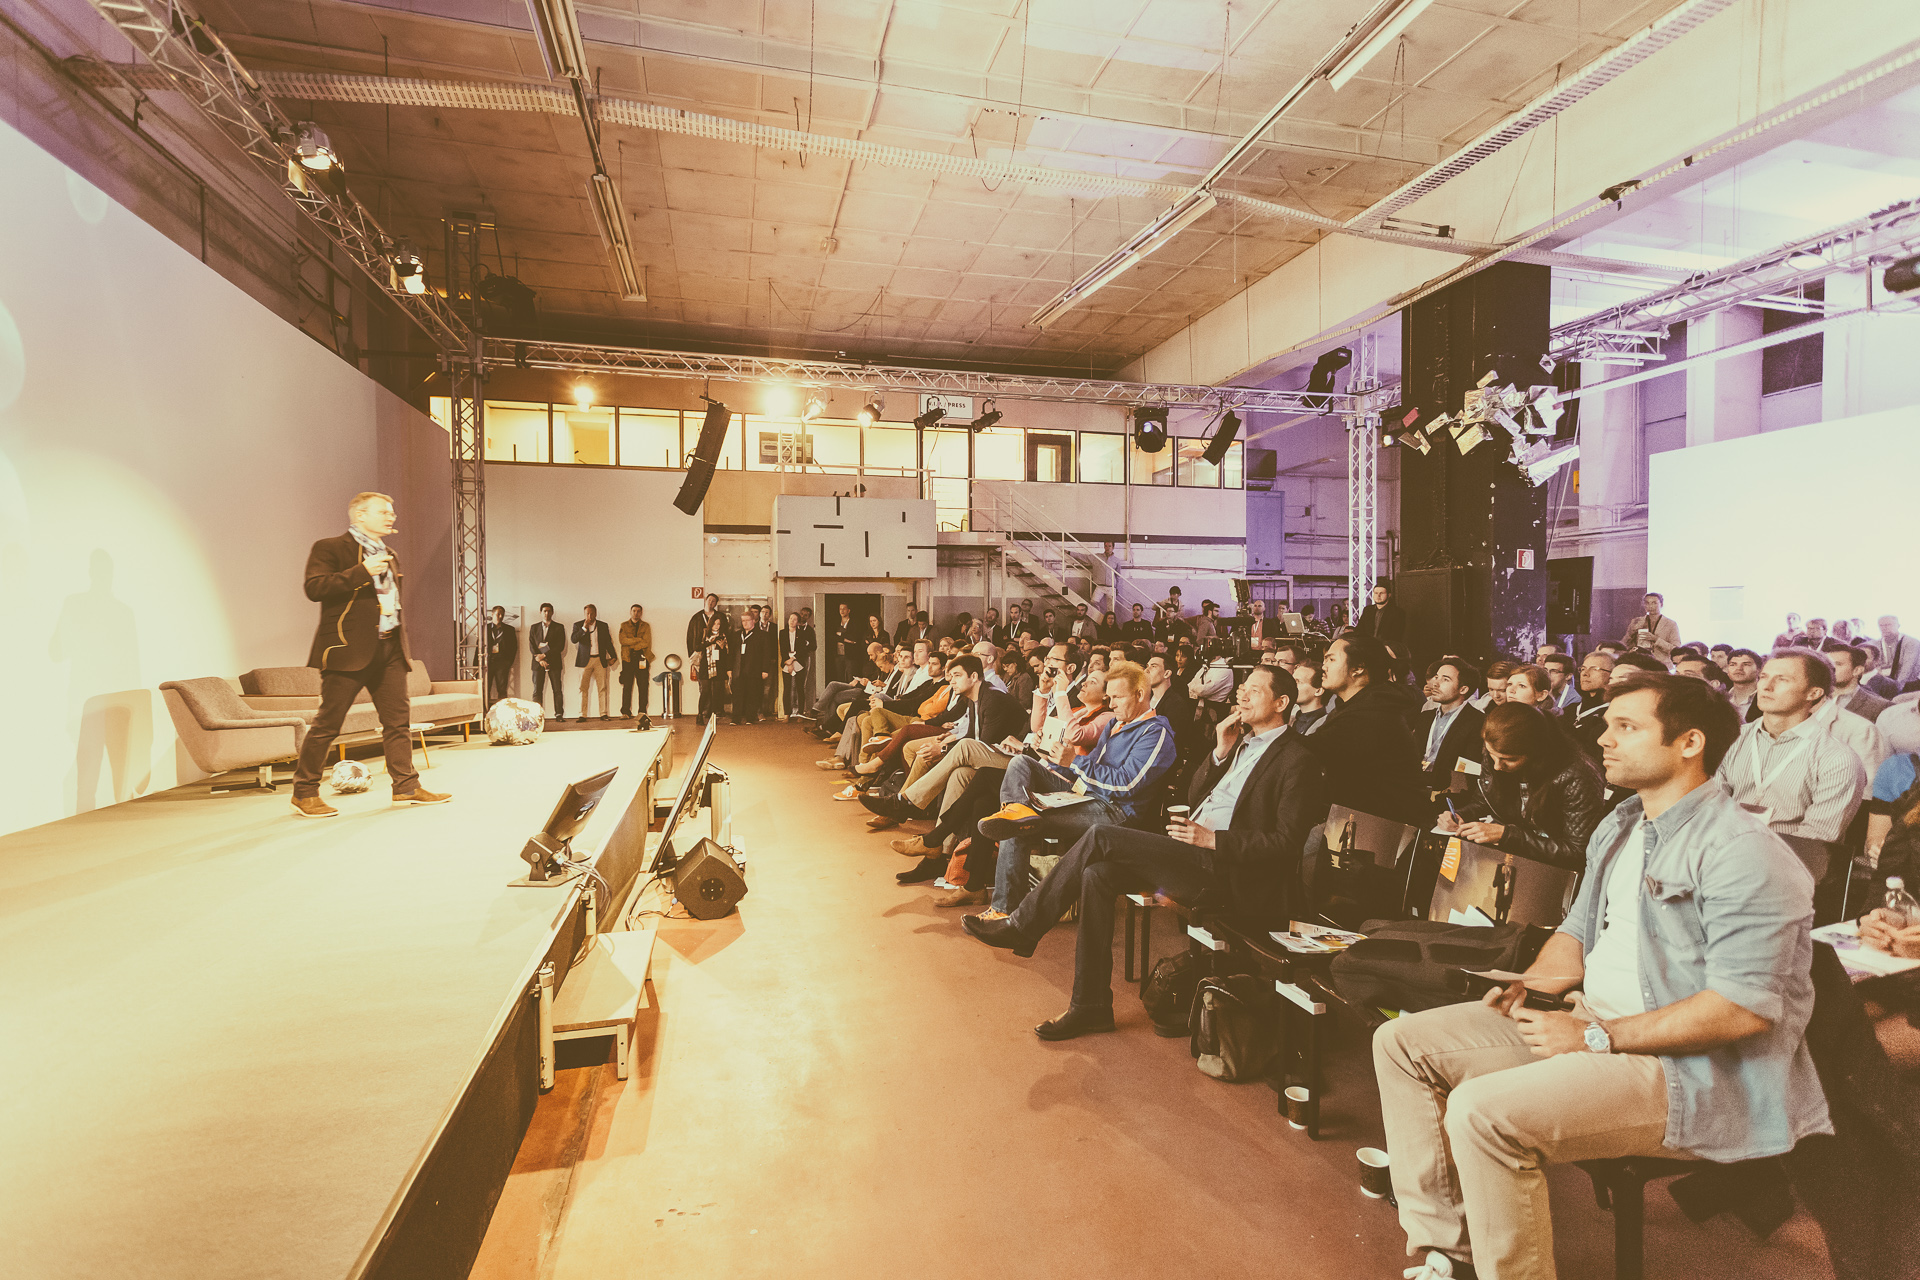 Eventorganisation | HEUREKA Conference by Gründerszene | 750 internationale Gäste